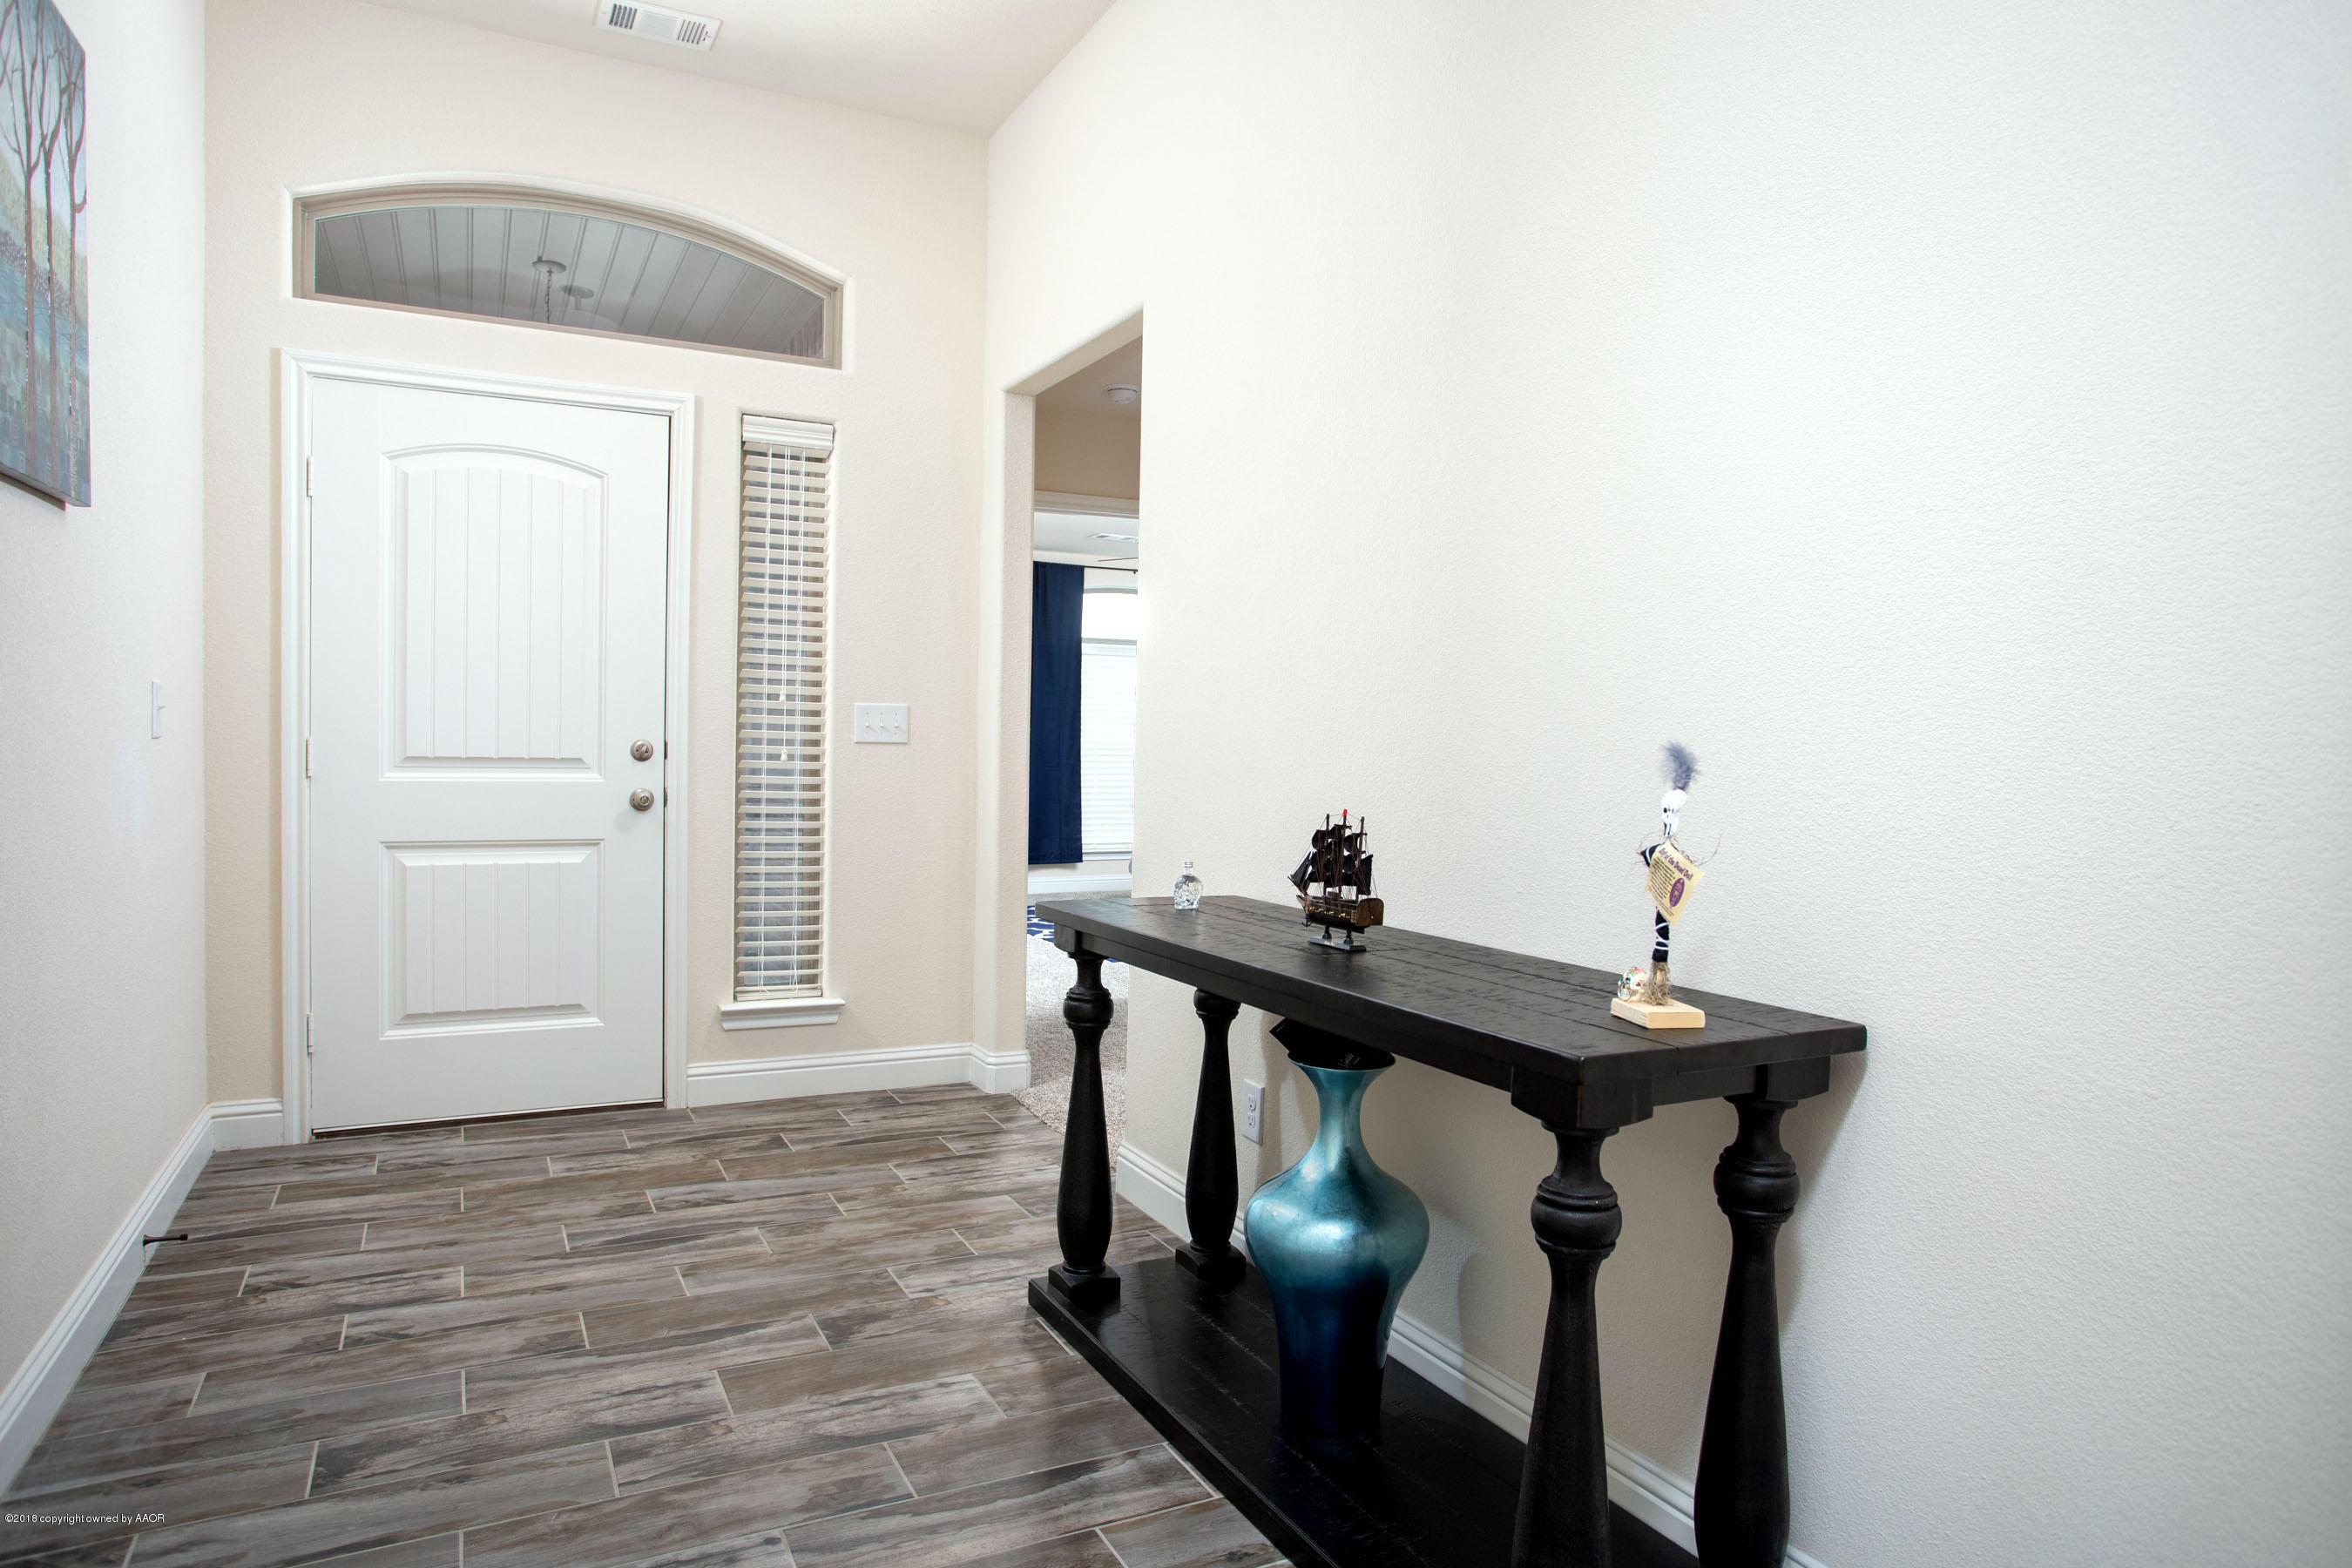 7302 Sinclair St, Amarillo, TX.| MLS# 18 118139 | Amarillo Real Estate |  Tracy Howland